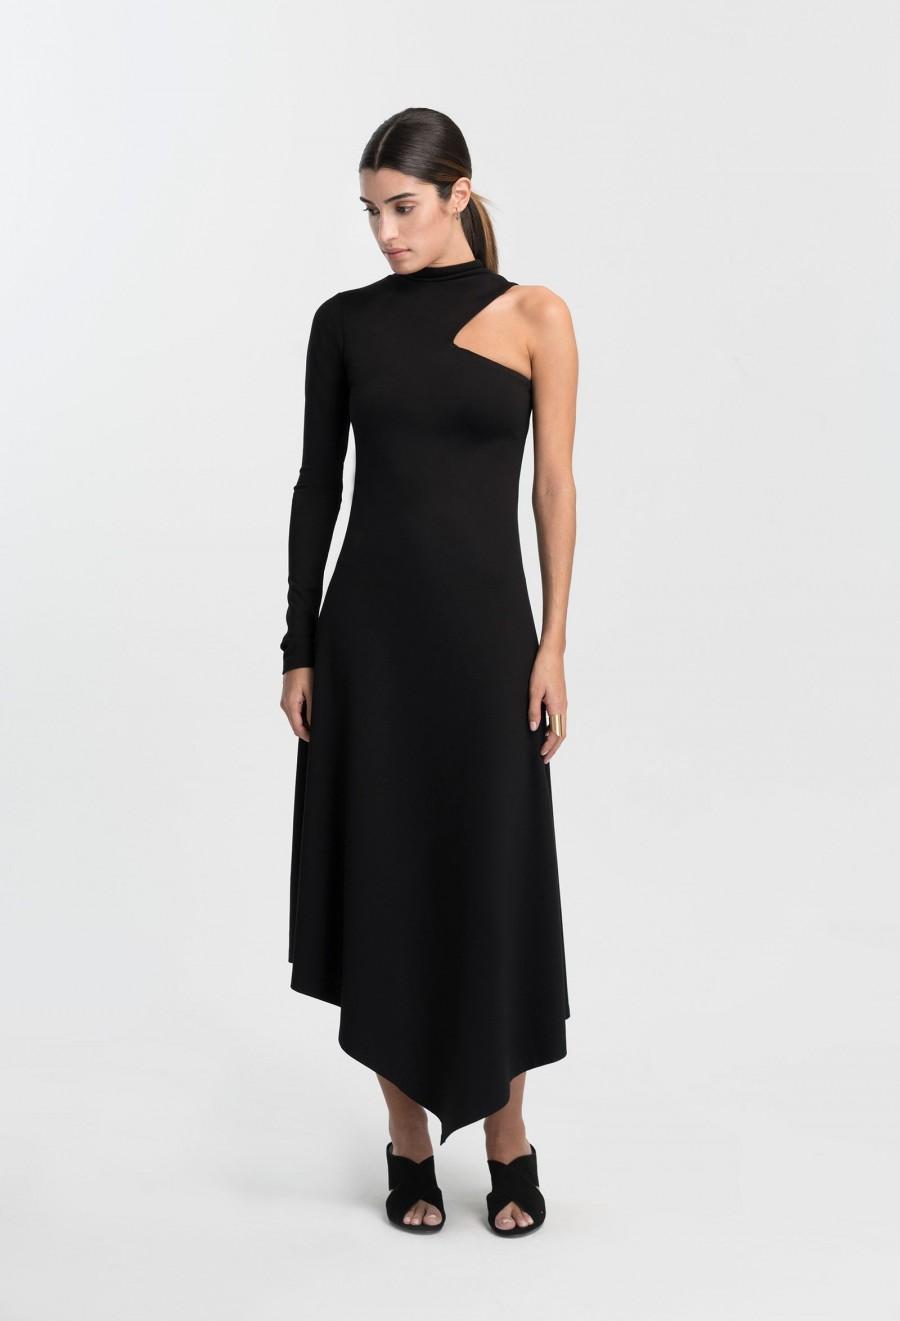 Свадьба - Cut Out Maxi Dress / Extravagant Dress / One Shoulder Dress / Cocktail Dress / Asymmetric Dress / Marcellamoda - MD1013